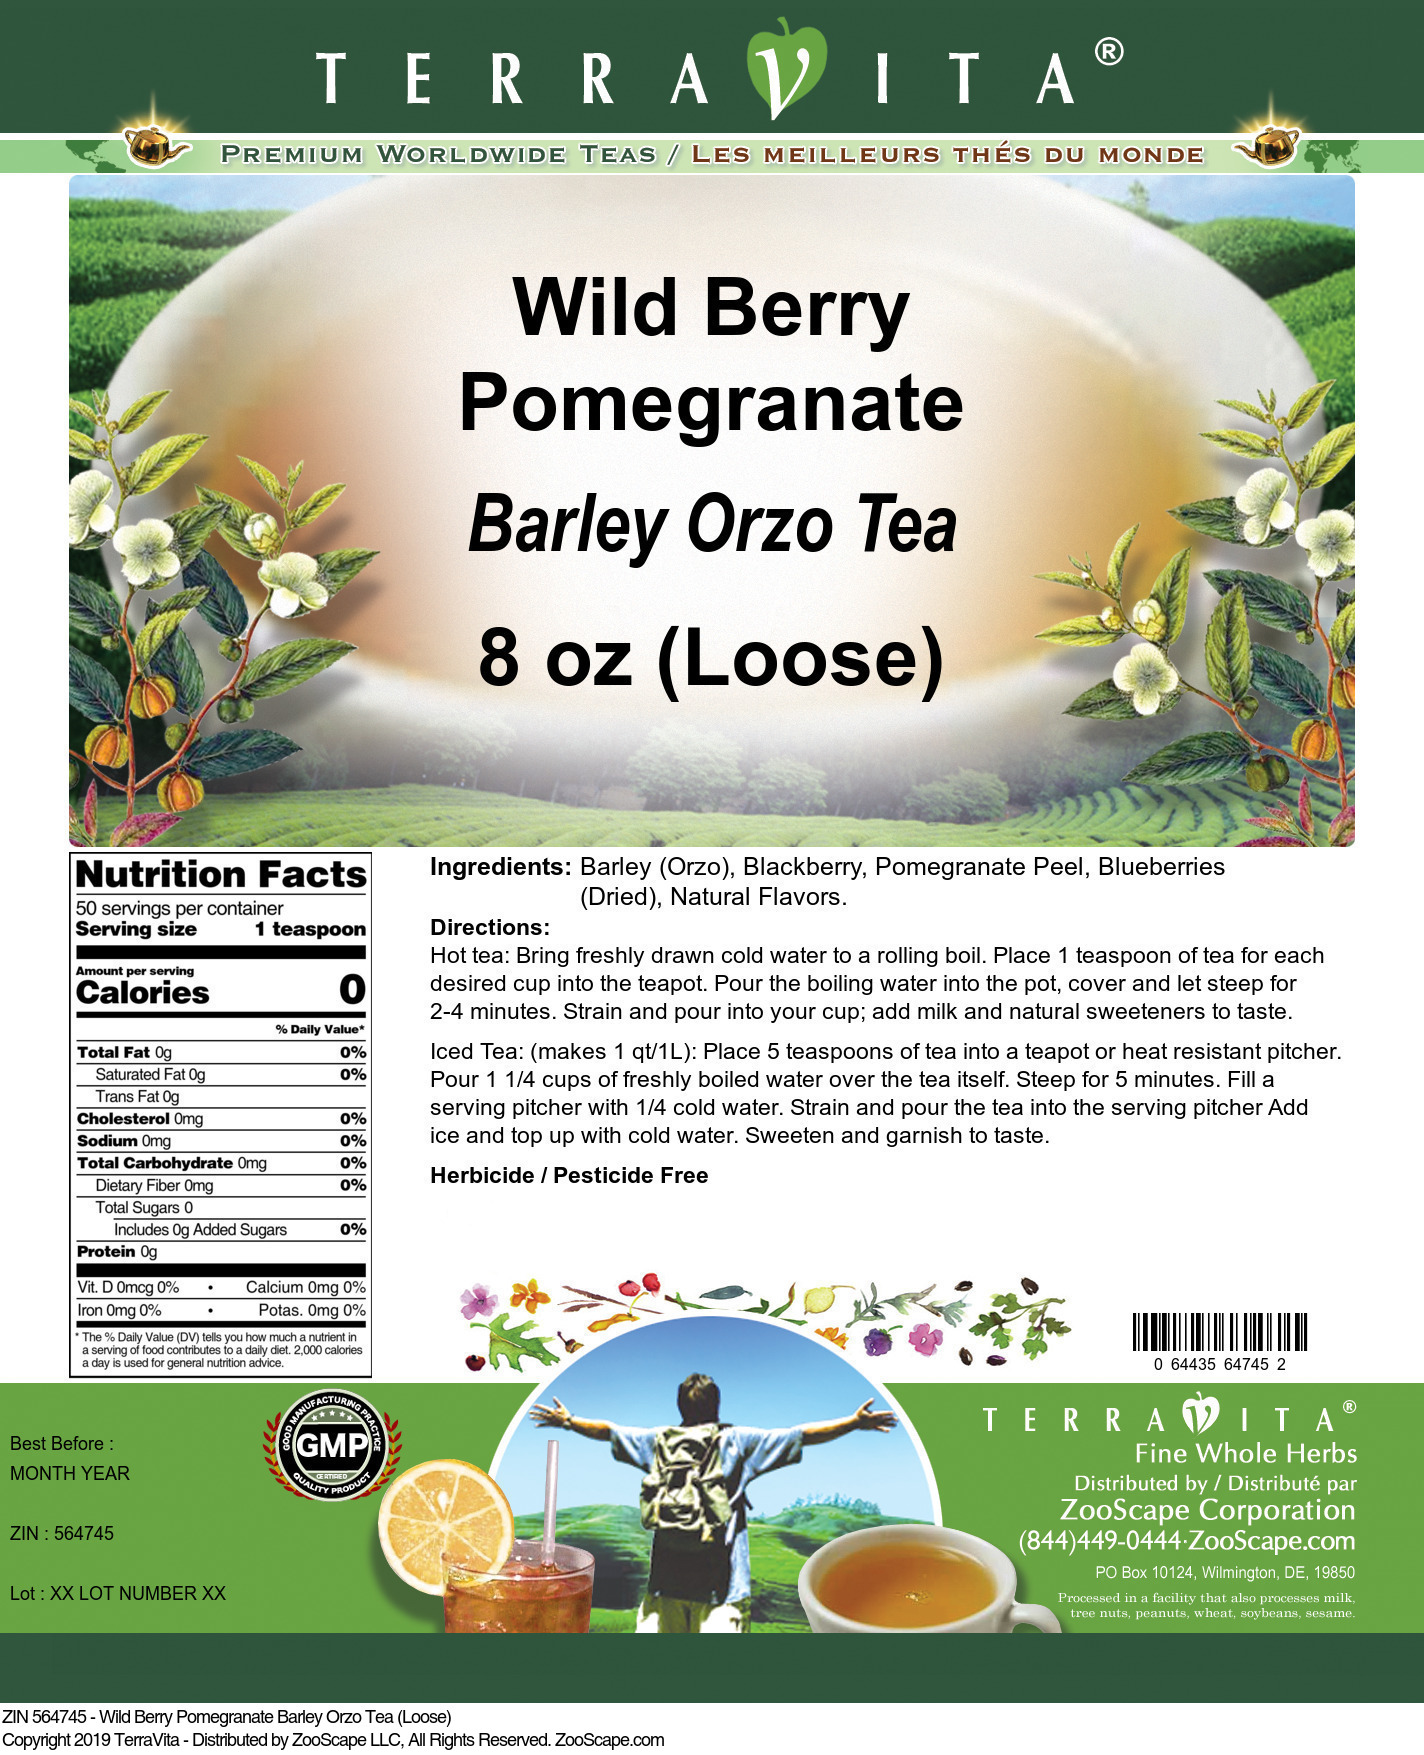 Wild Berry Pomegranate Barley Orzo Tea (Loose)